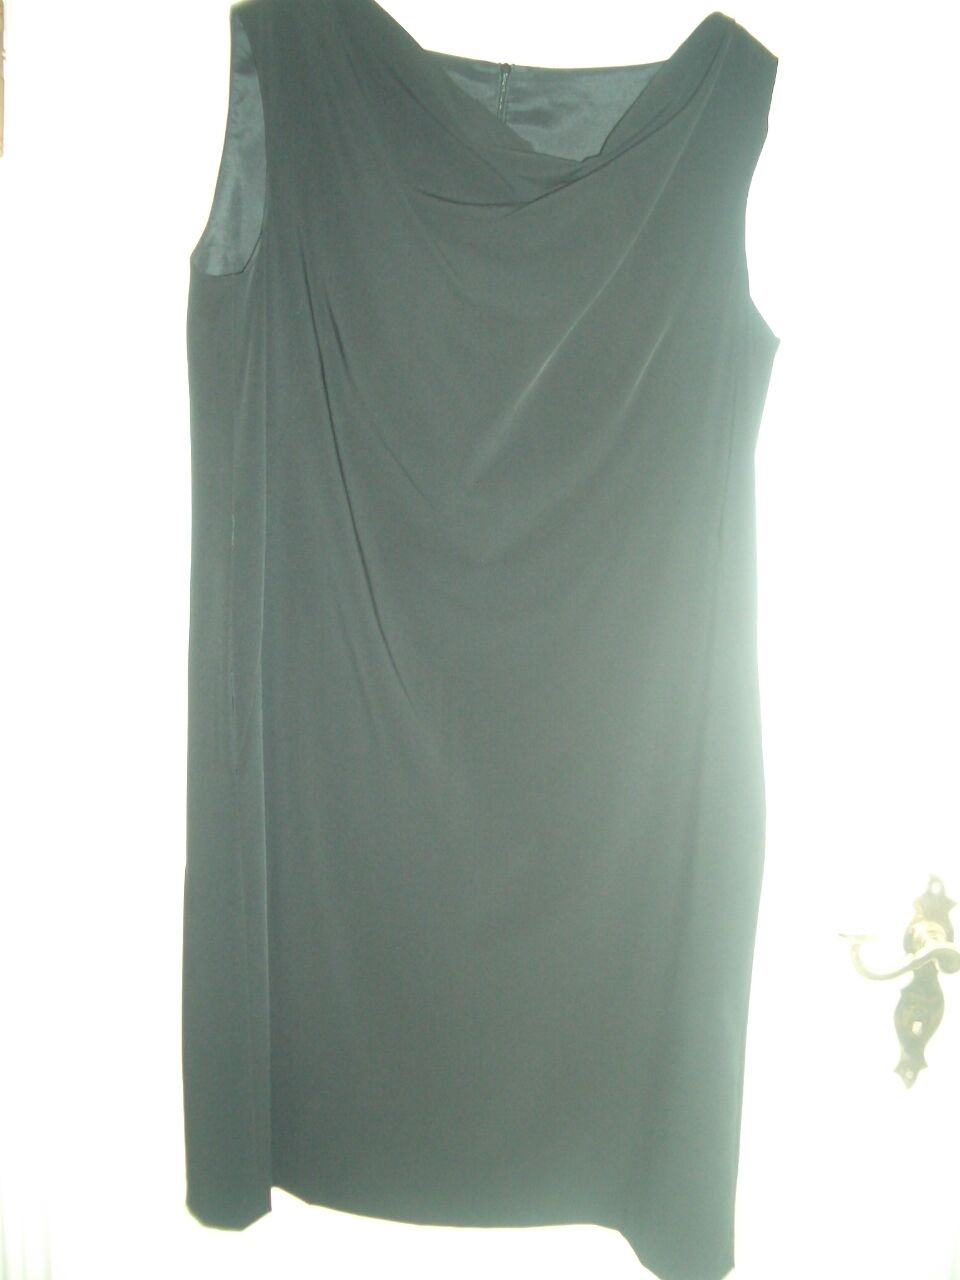 LUXUS DESIGNER ESCADA Etui Kleid EVENT black dress 42 44 NP1120,-STATEMENT TOP